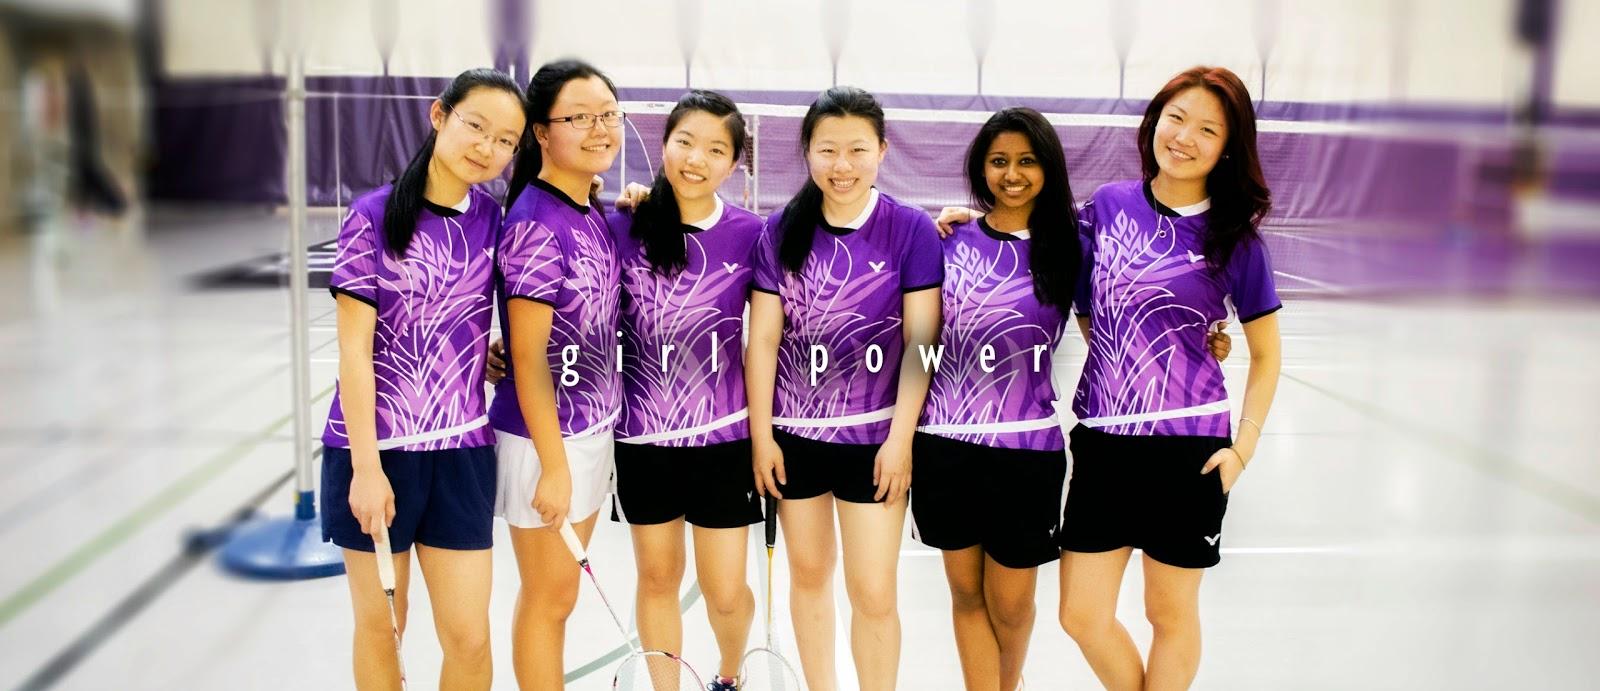 NYU Badminton